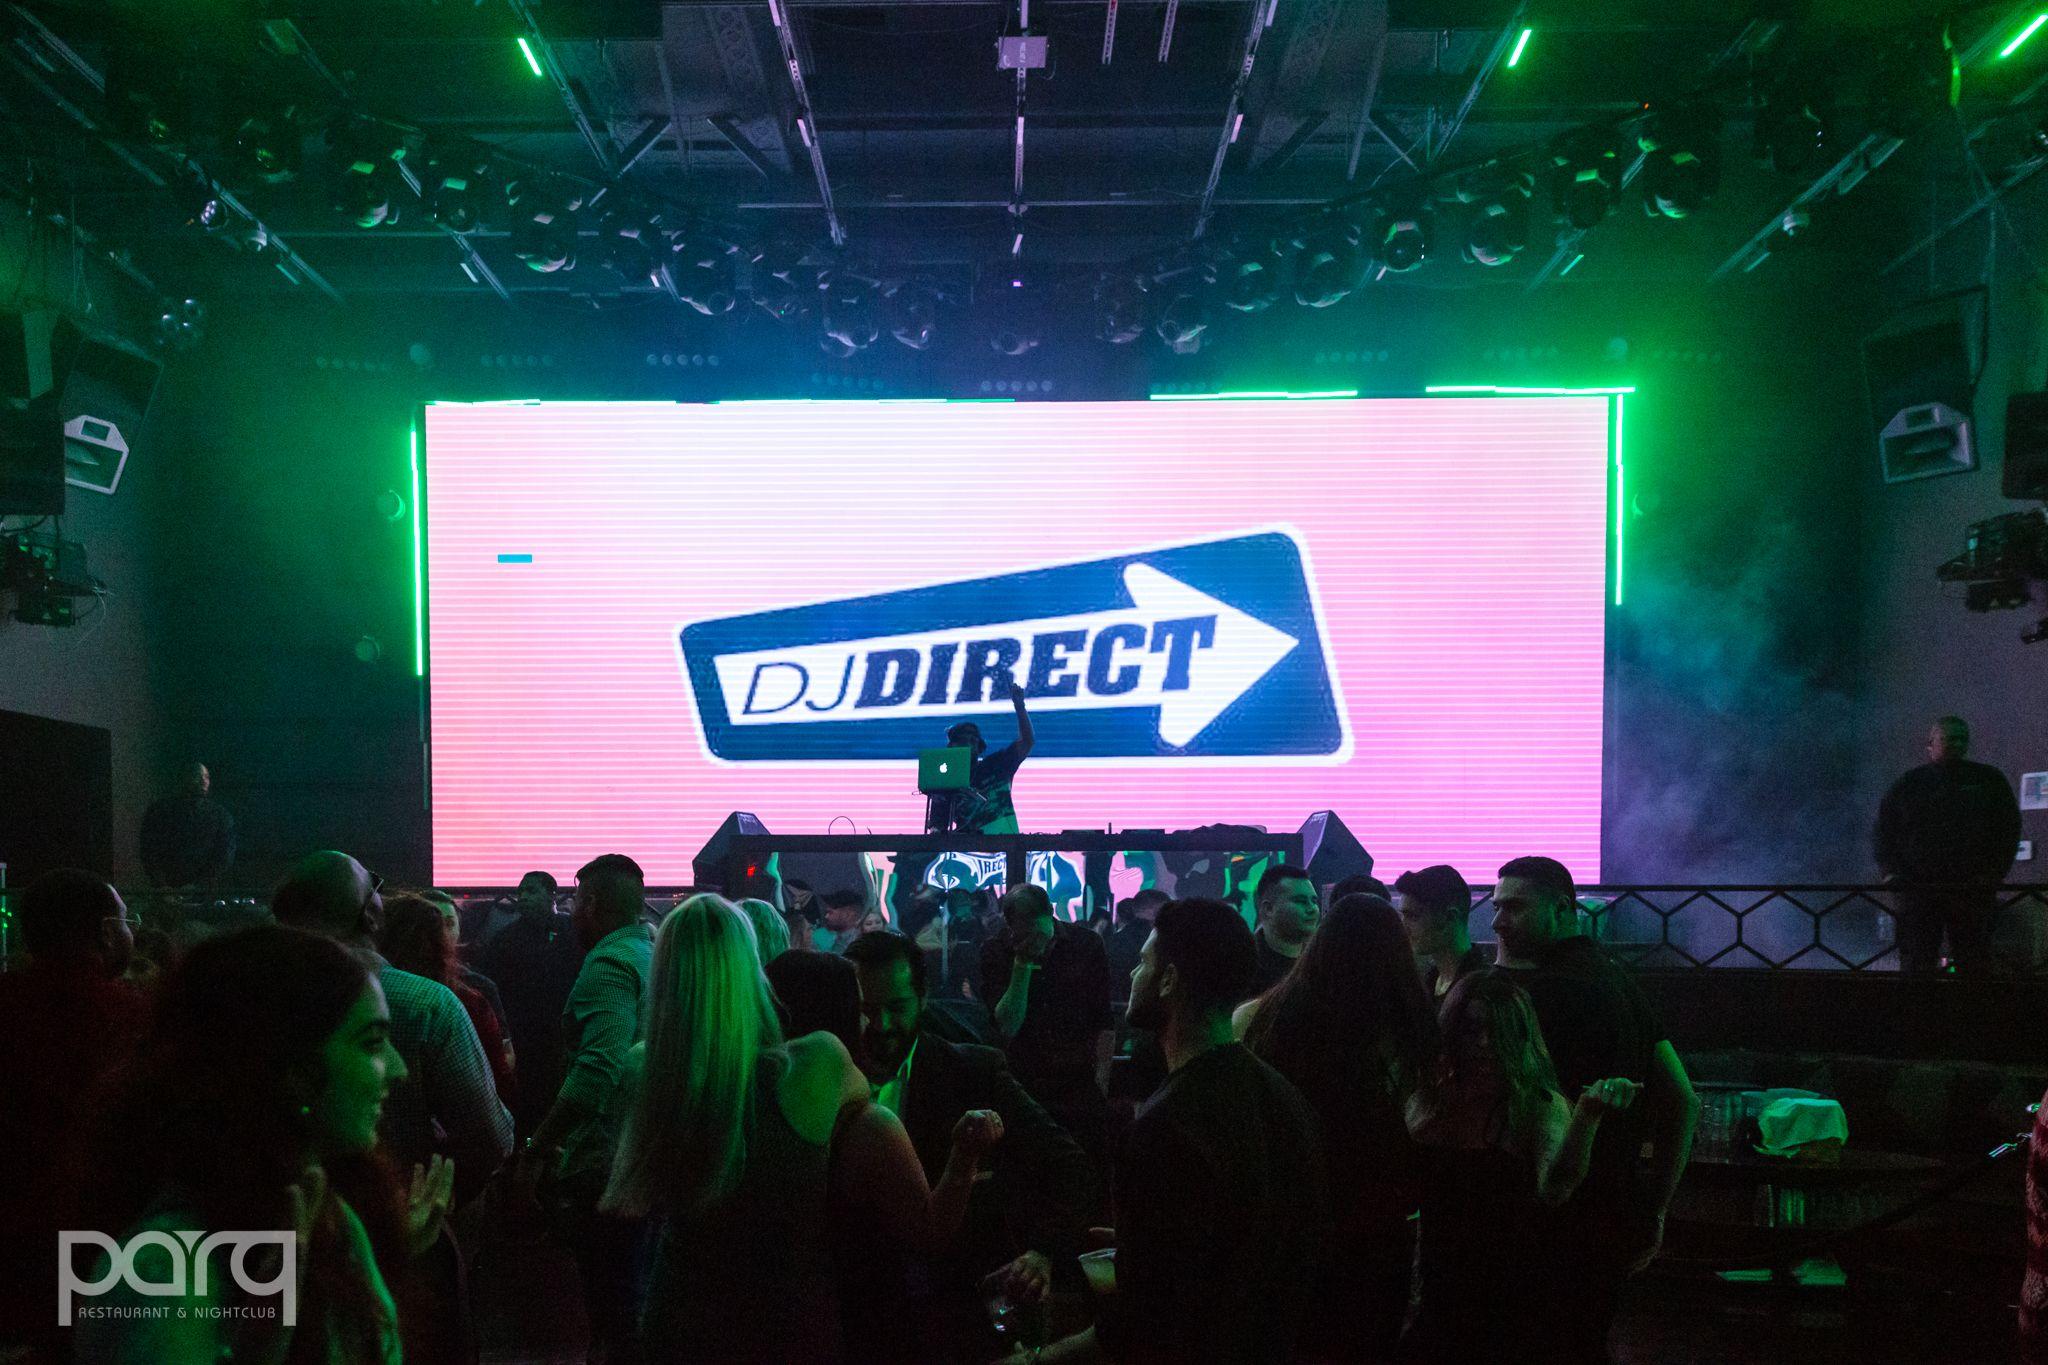 12.21.18 Parq - Direct-21.jpg